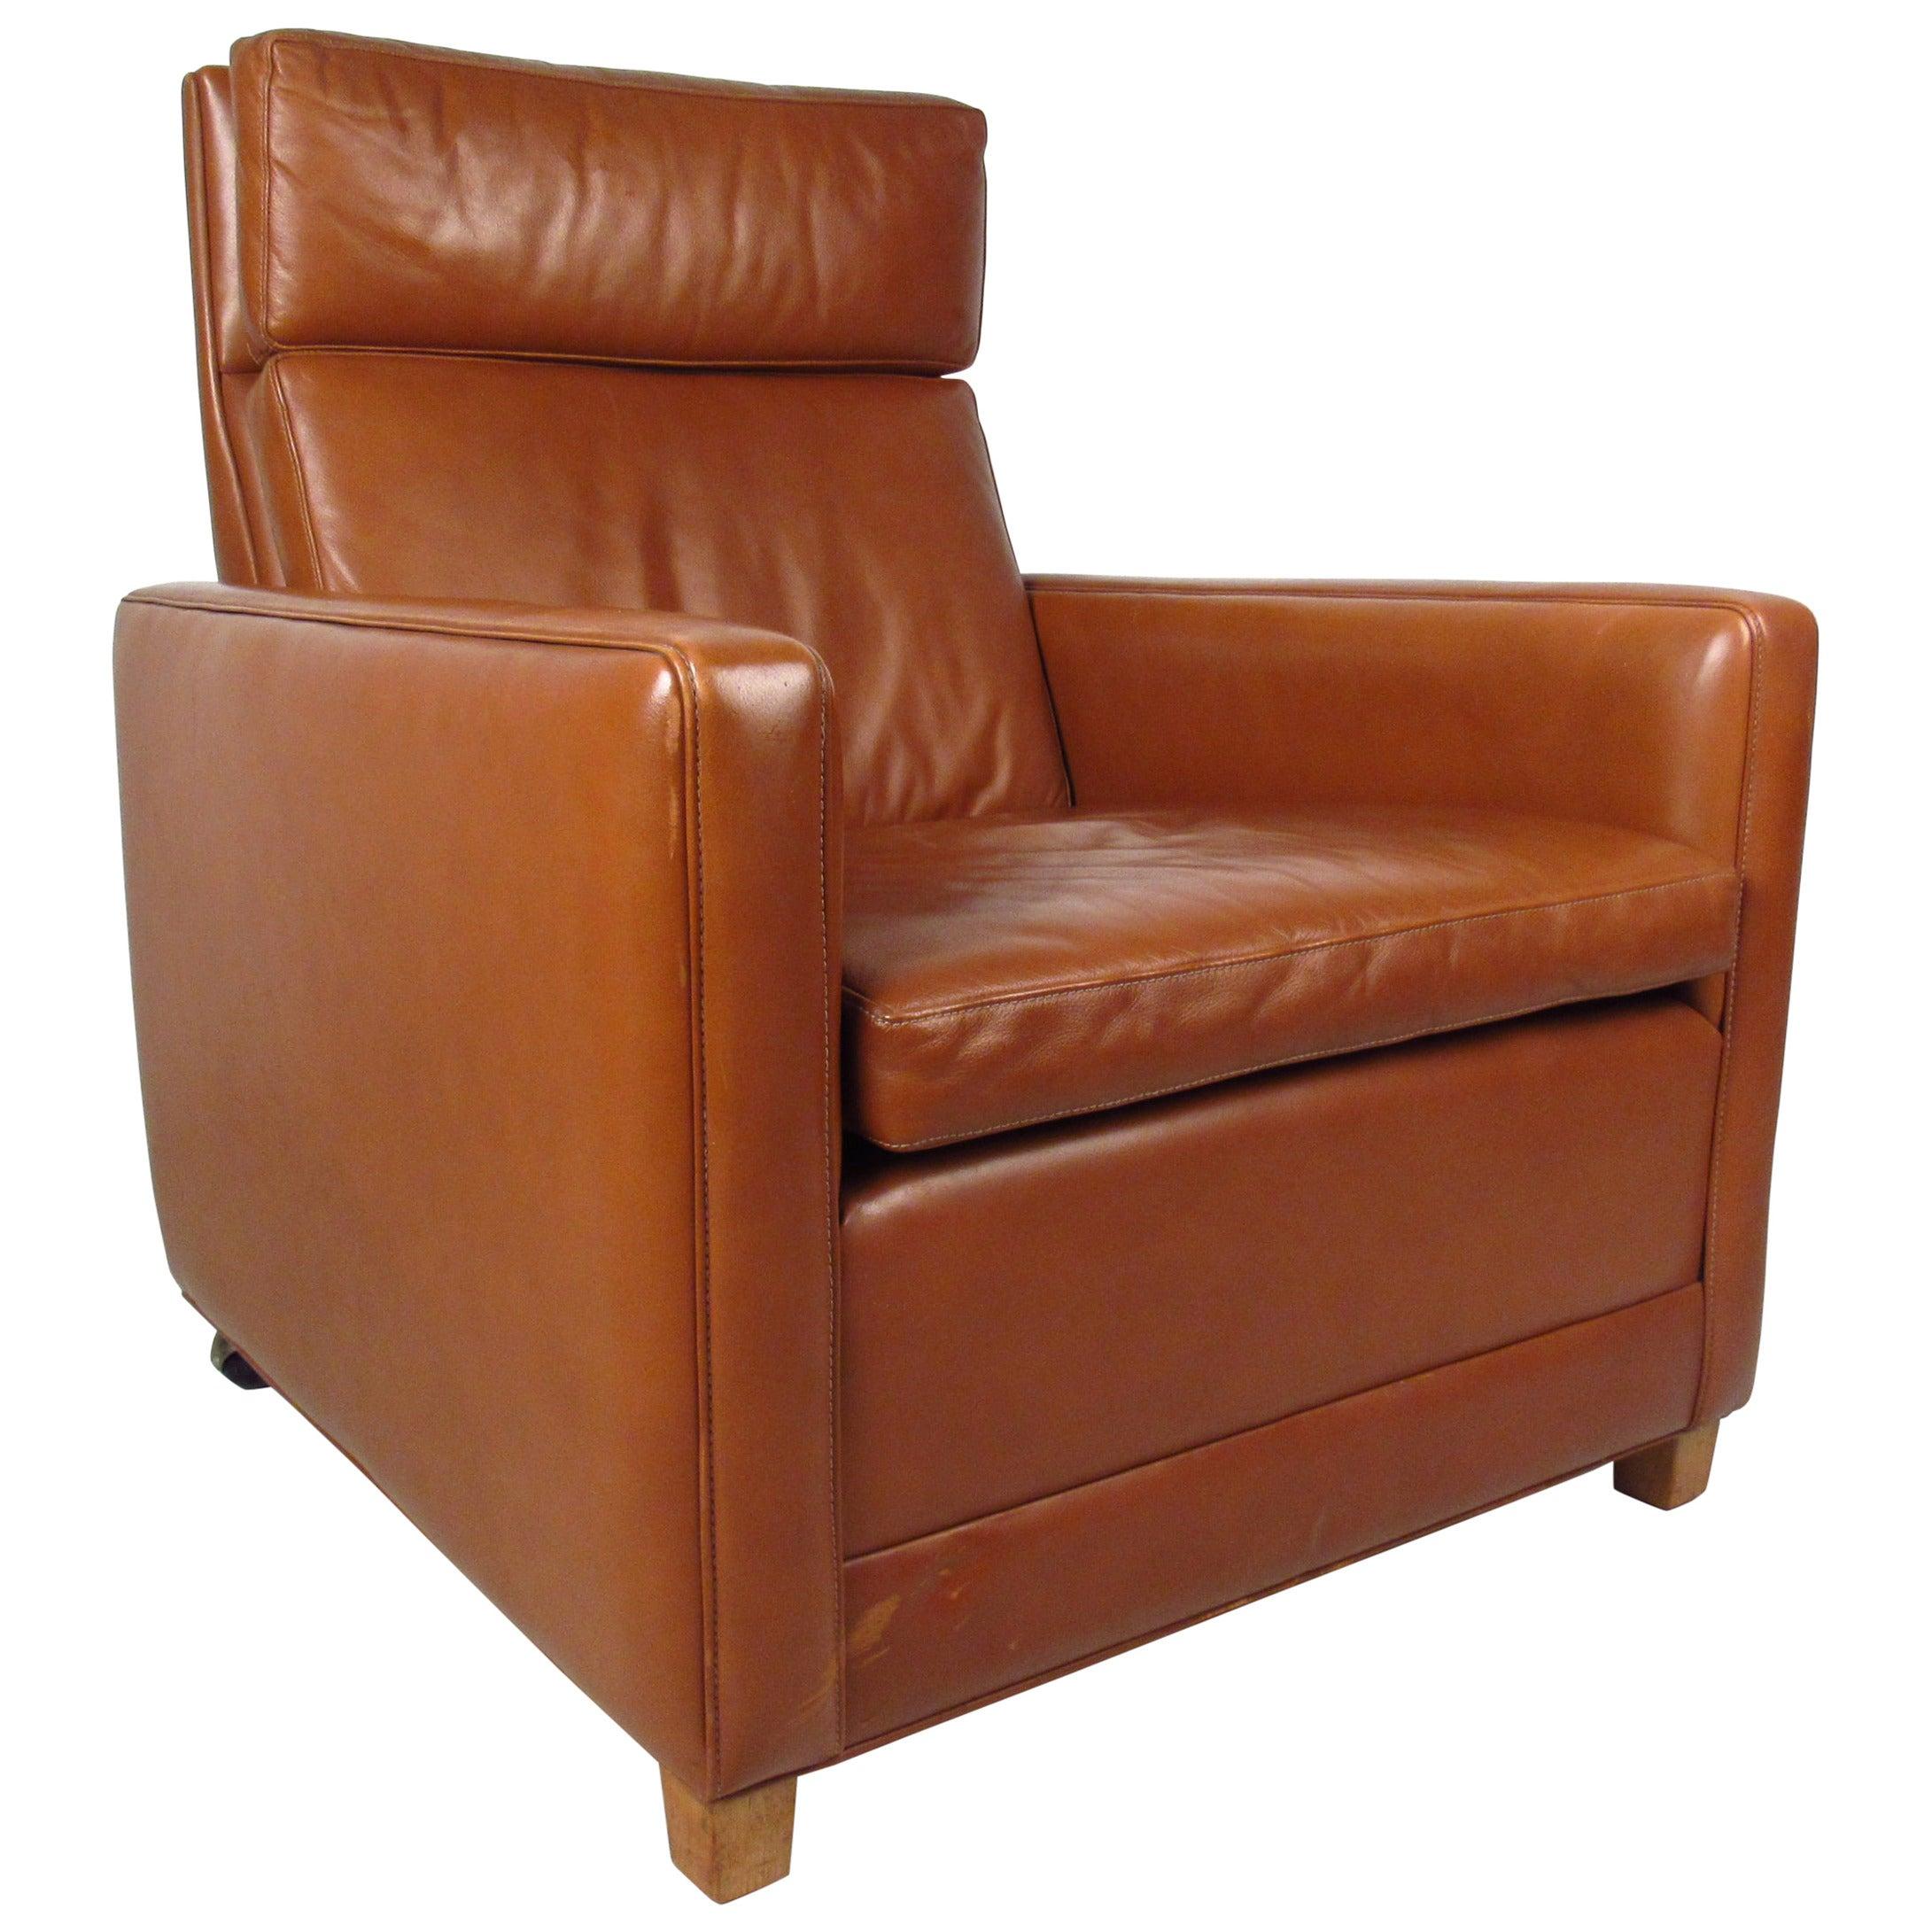 Børge Mogensen Leather Lounge Chair